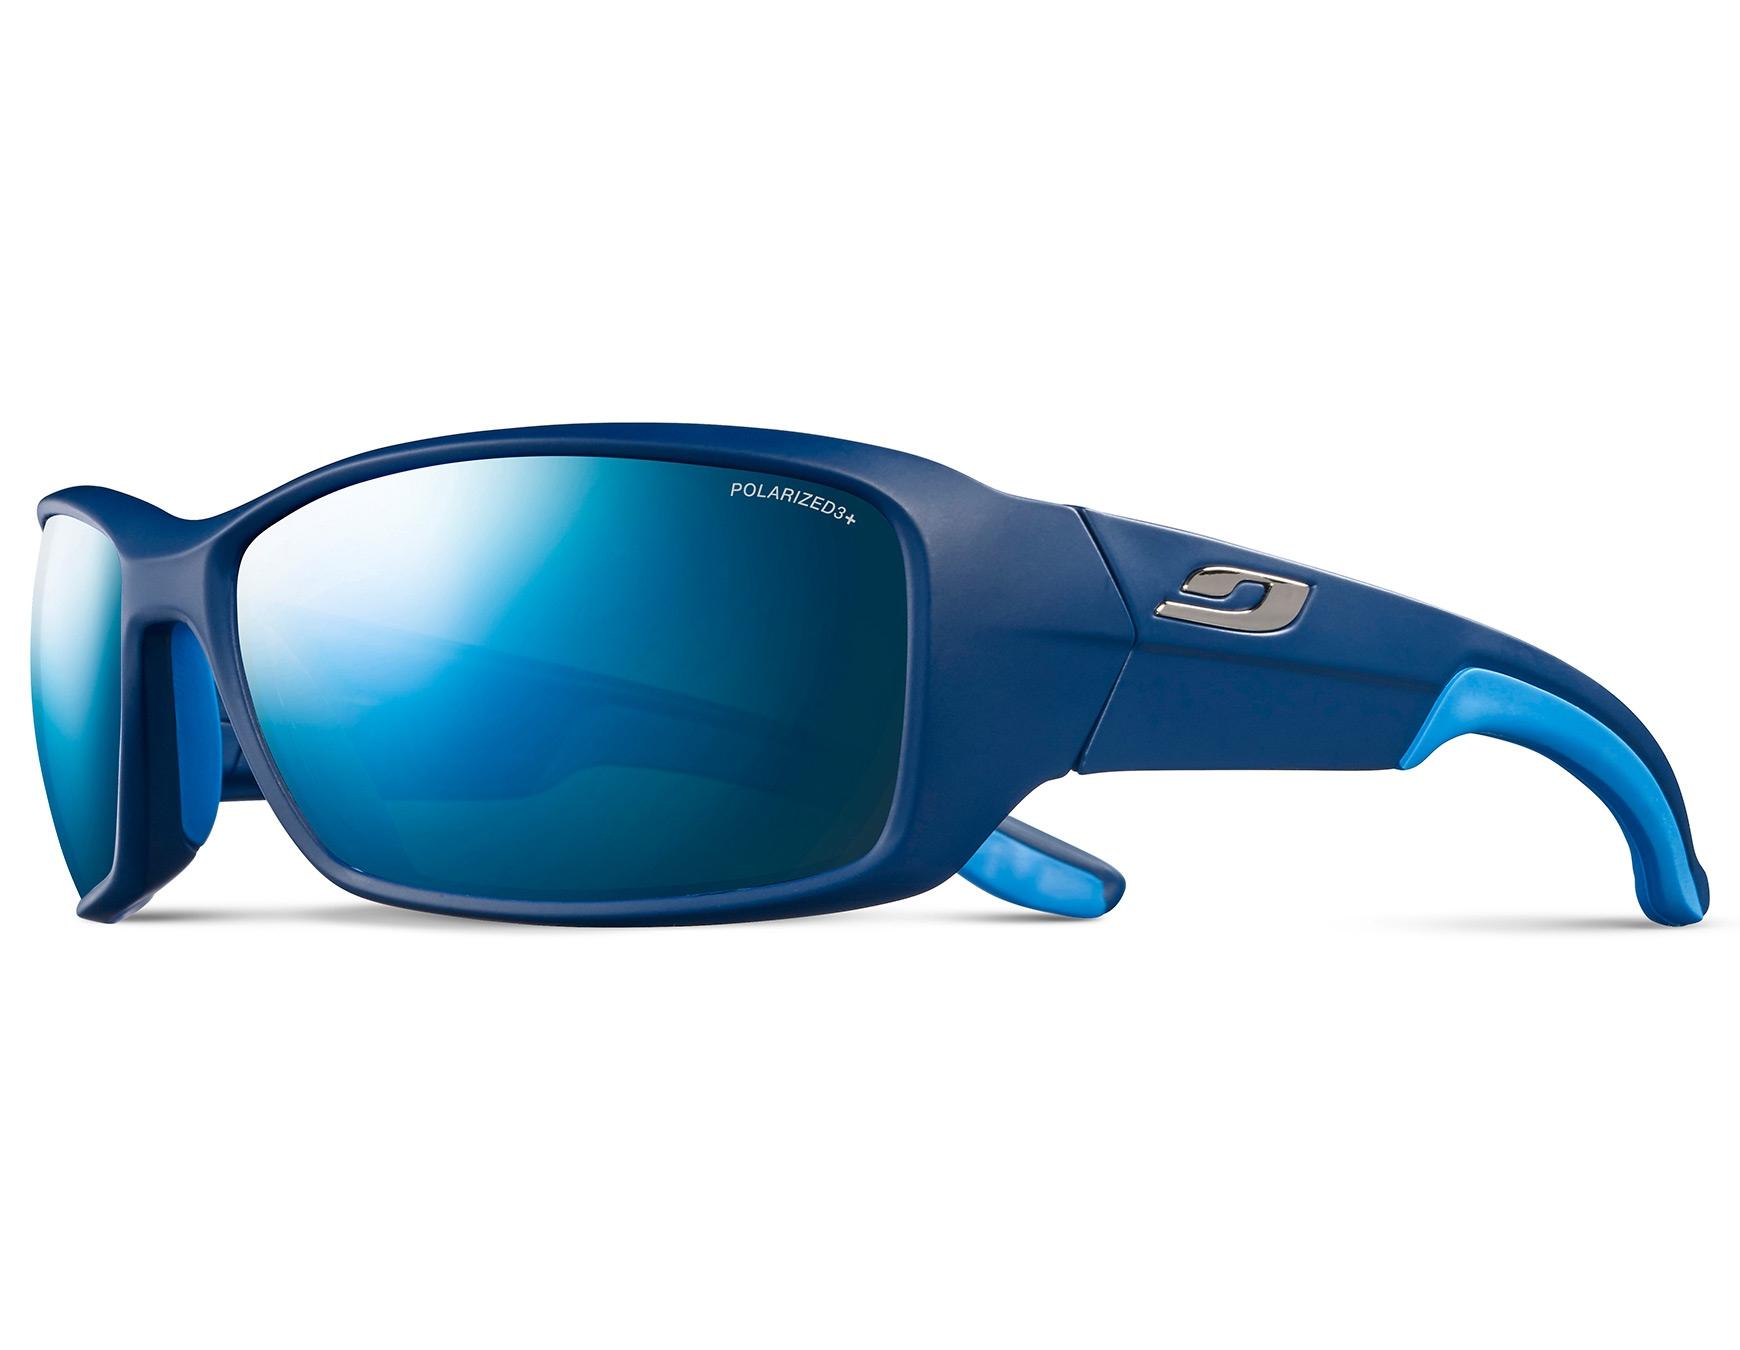 Run Bleu Mat Bleu Polarized 3+ Julbo   Lunettes de soleil   Snowleader 7c891510923e